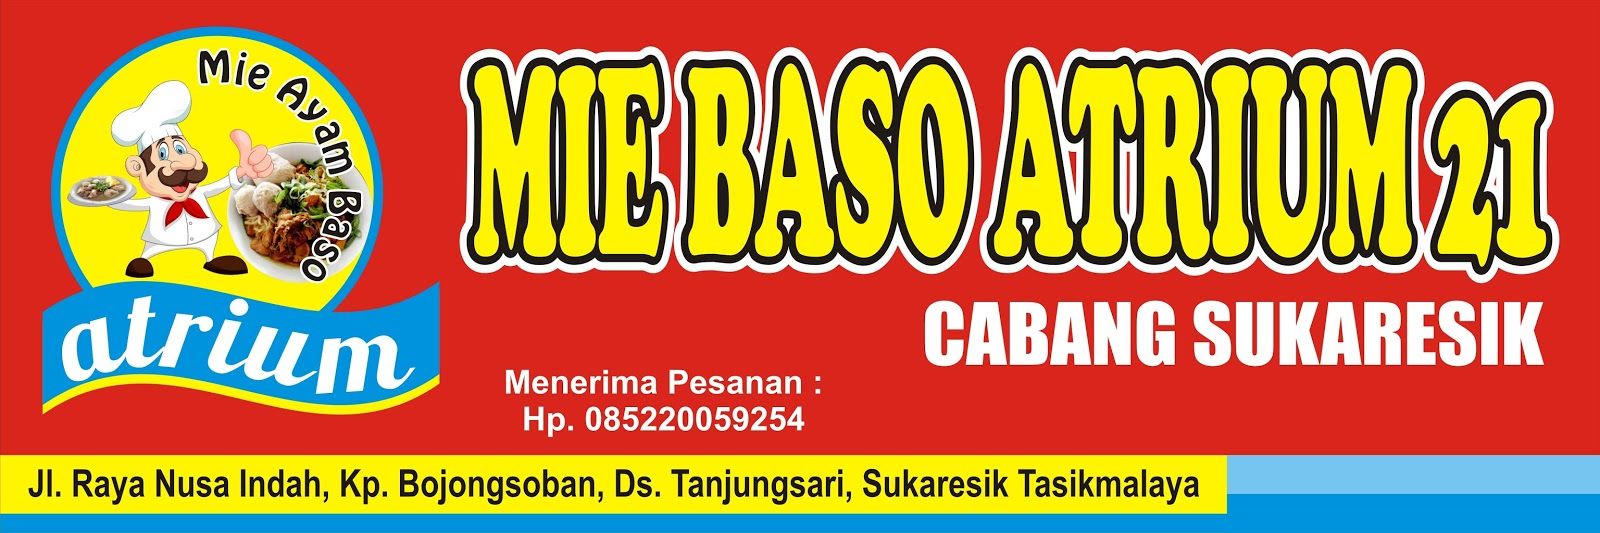 Contoh Baliho Warung Bakso - desain spanduk keren